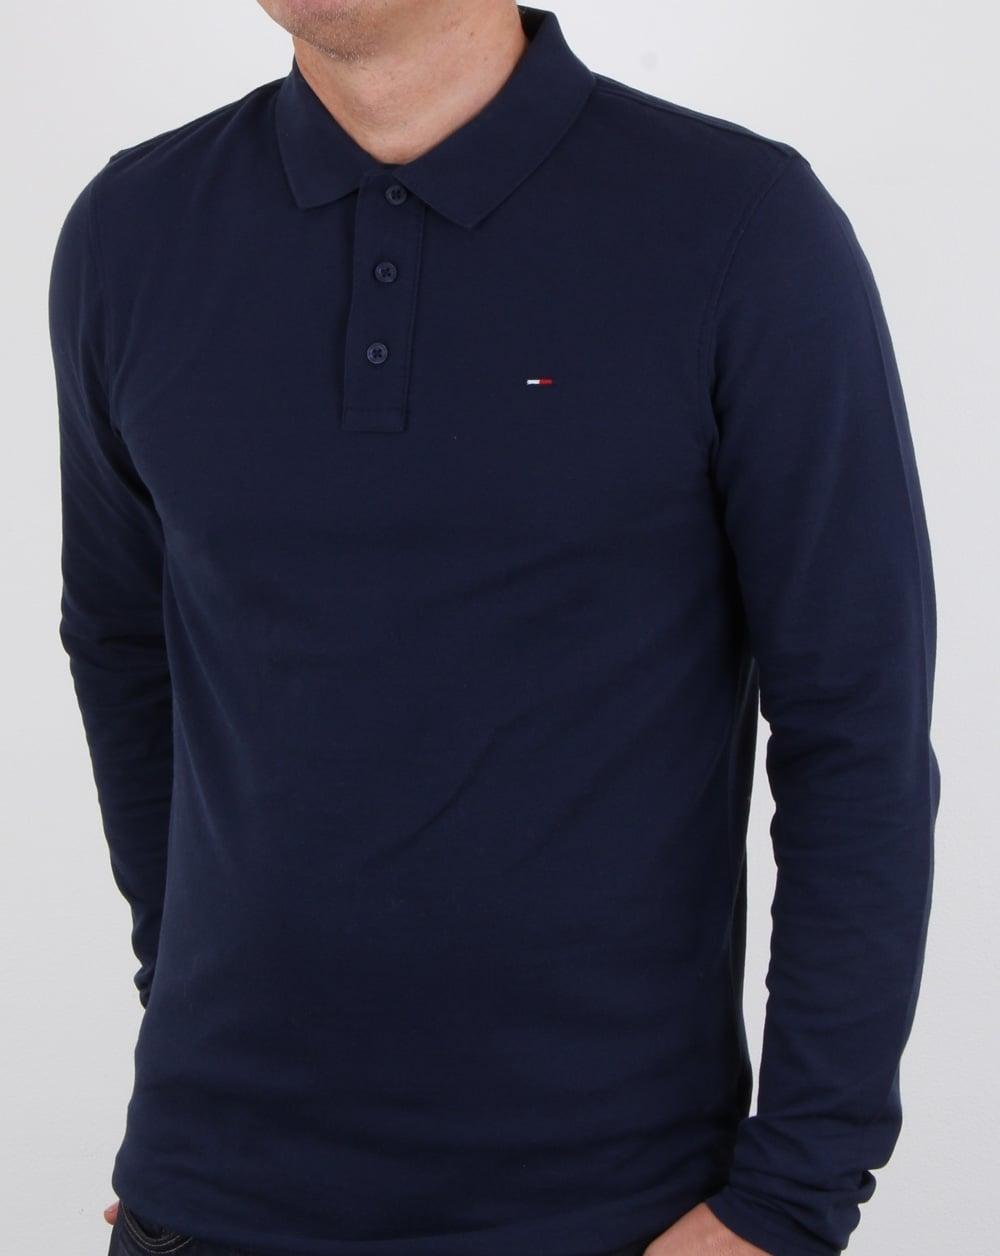 c98534c9ffe175 Tommy Hilfiger Long Sleeve Polo Shirt Navy, Mens, Cotton, Long Sleeve